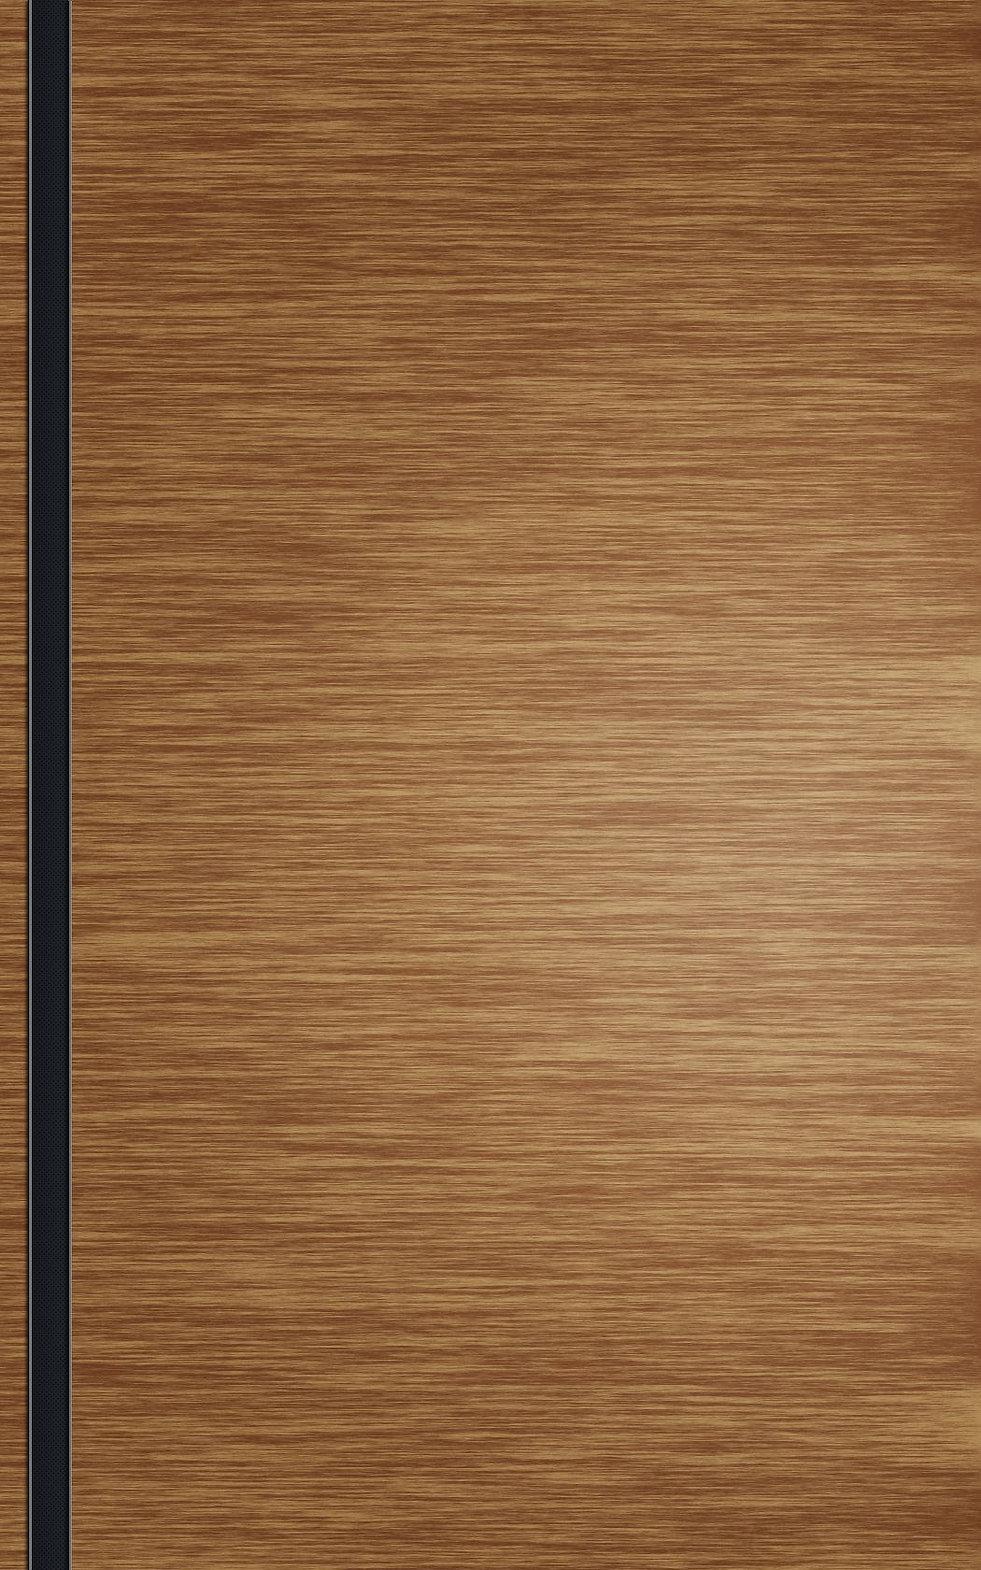 Fondox.net_textura-de-madera-elegante_16